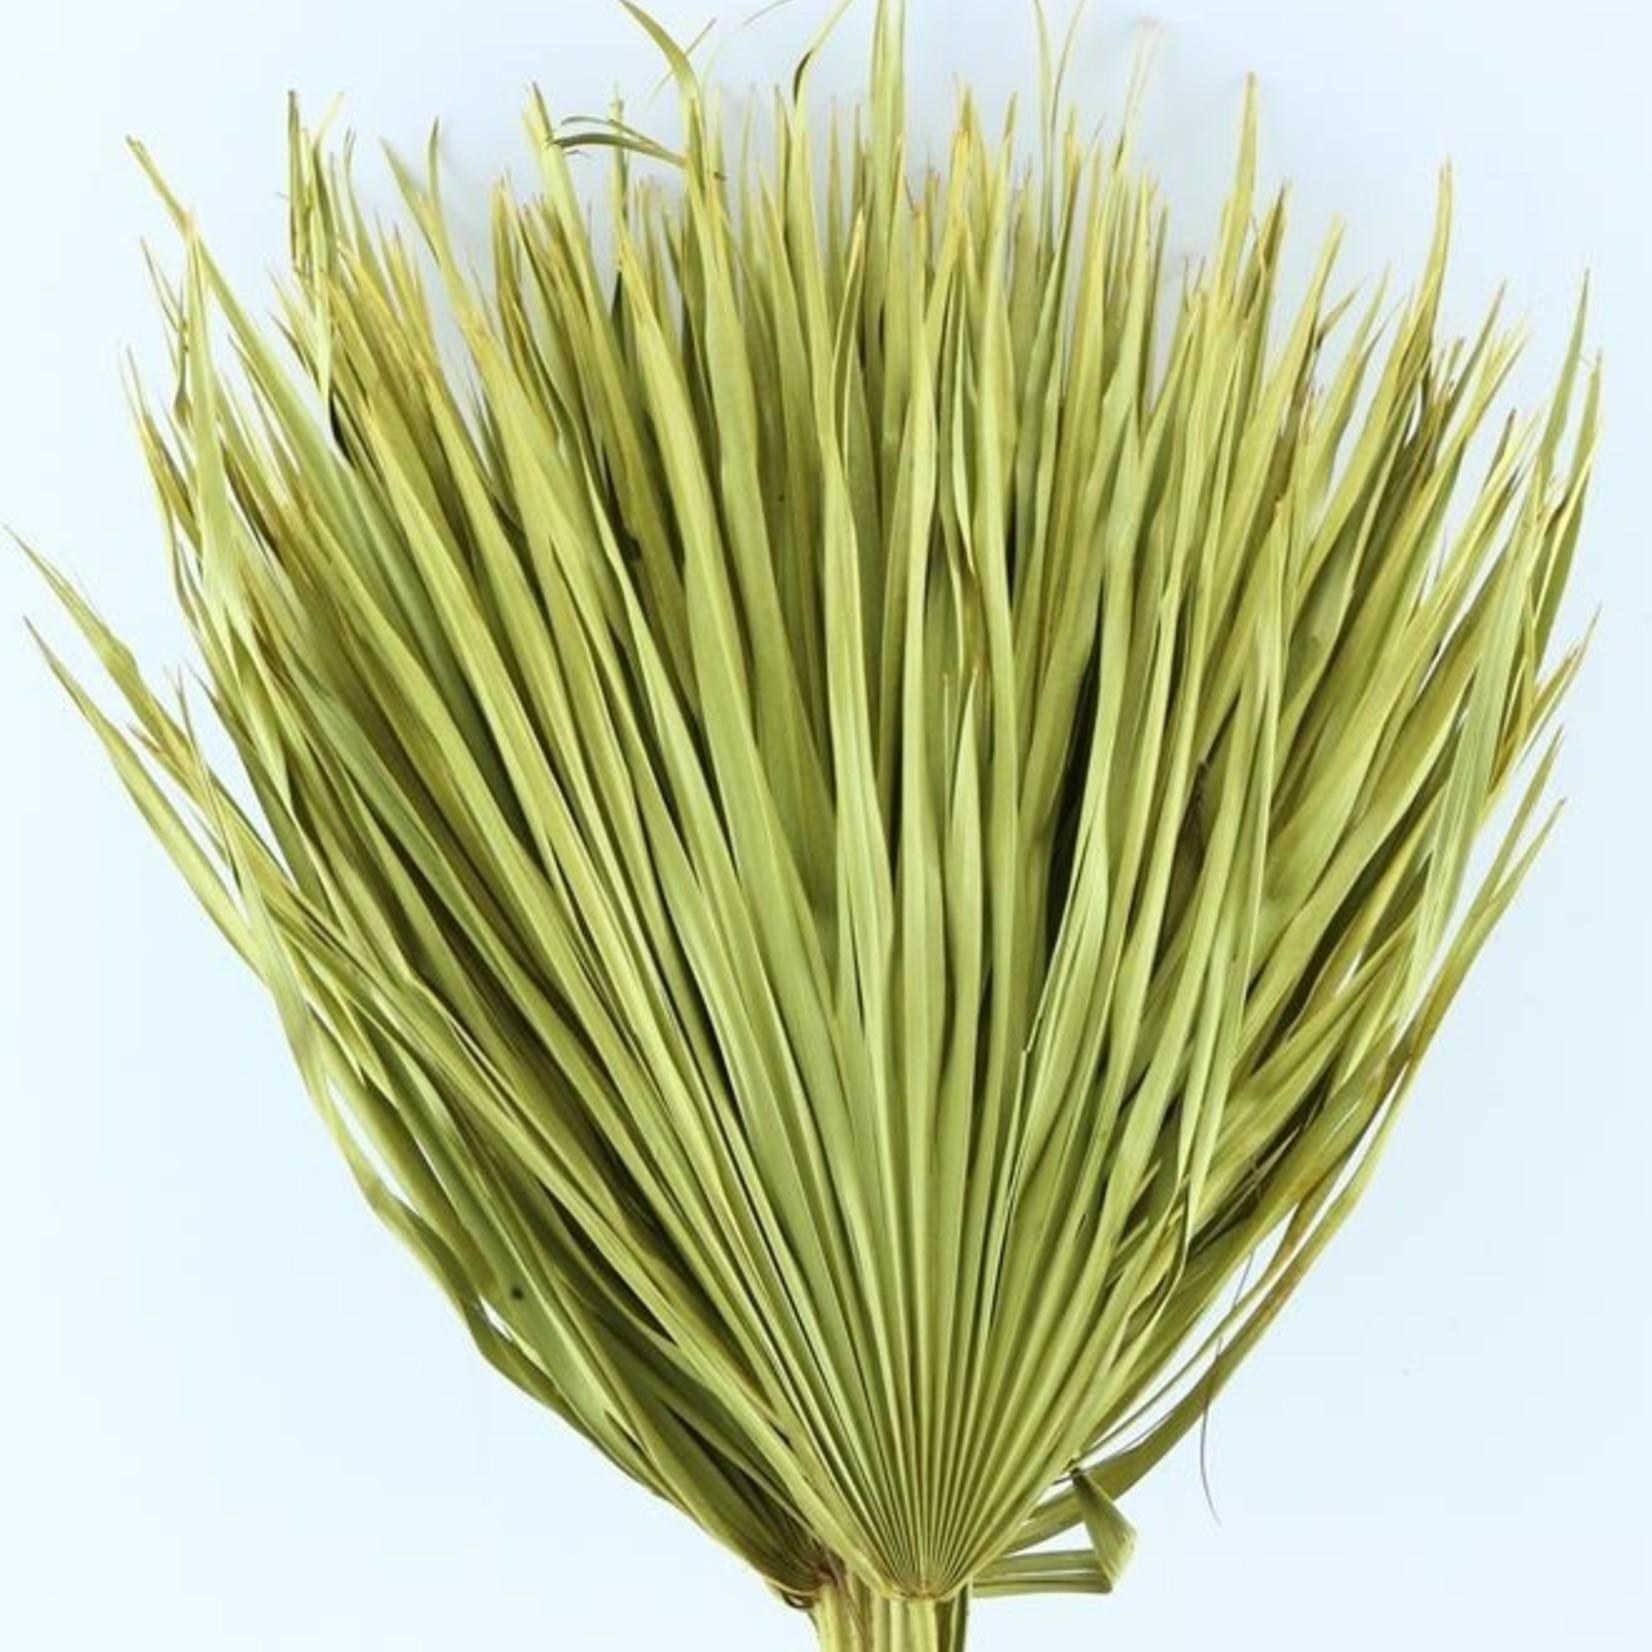 Gedroogde Chamaerops (palmblad) geel, per 3 takken